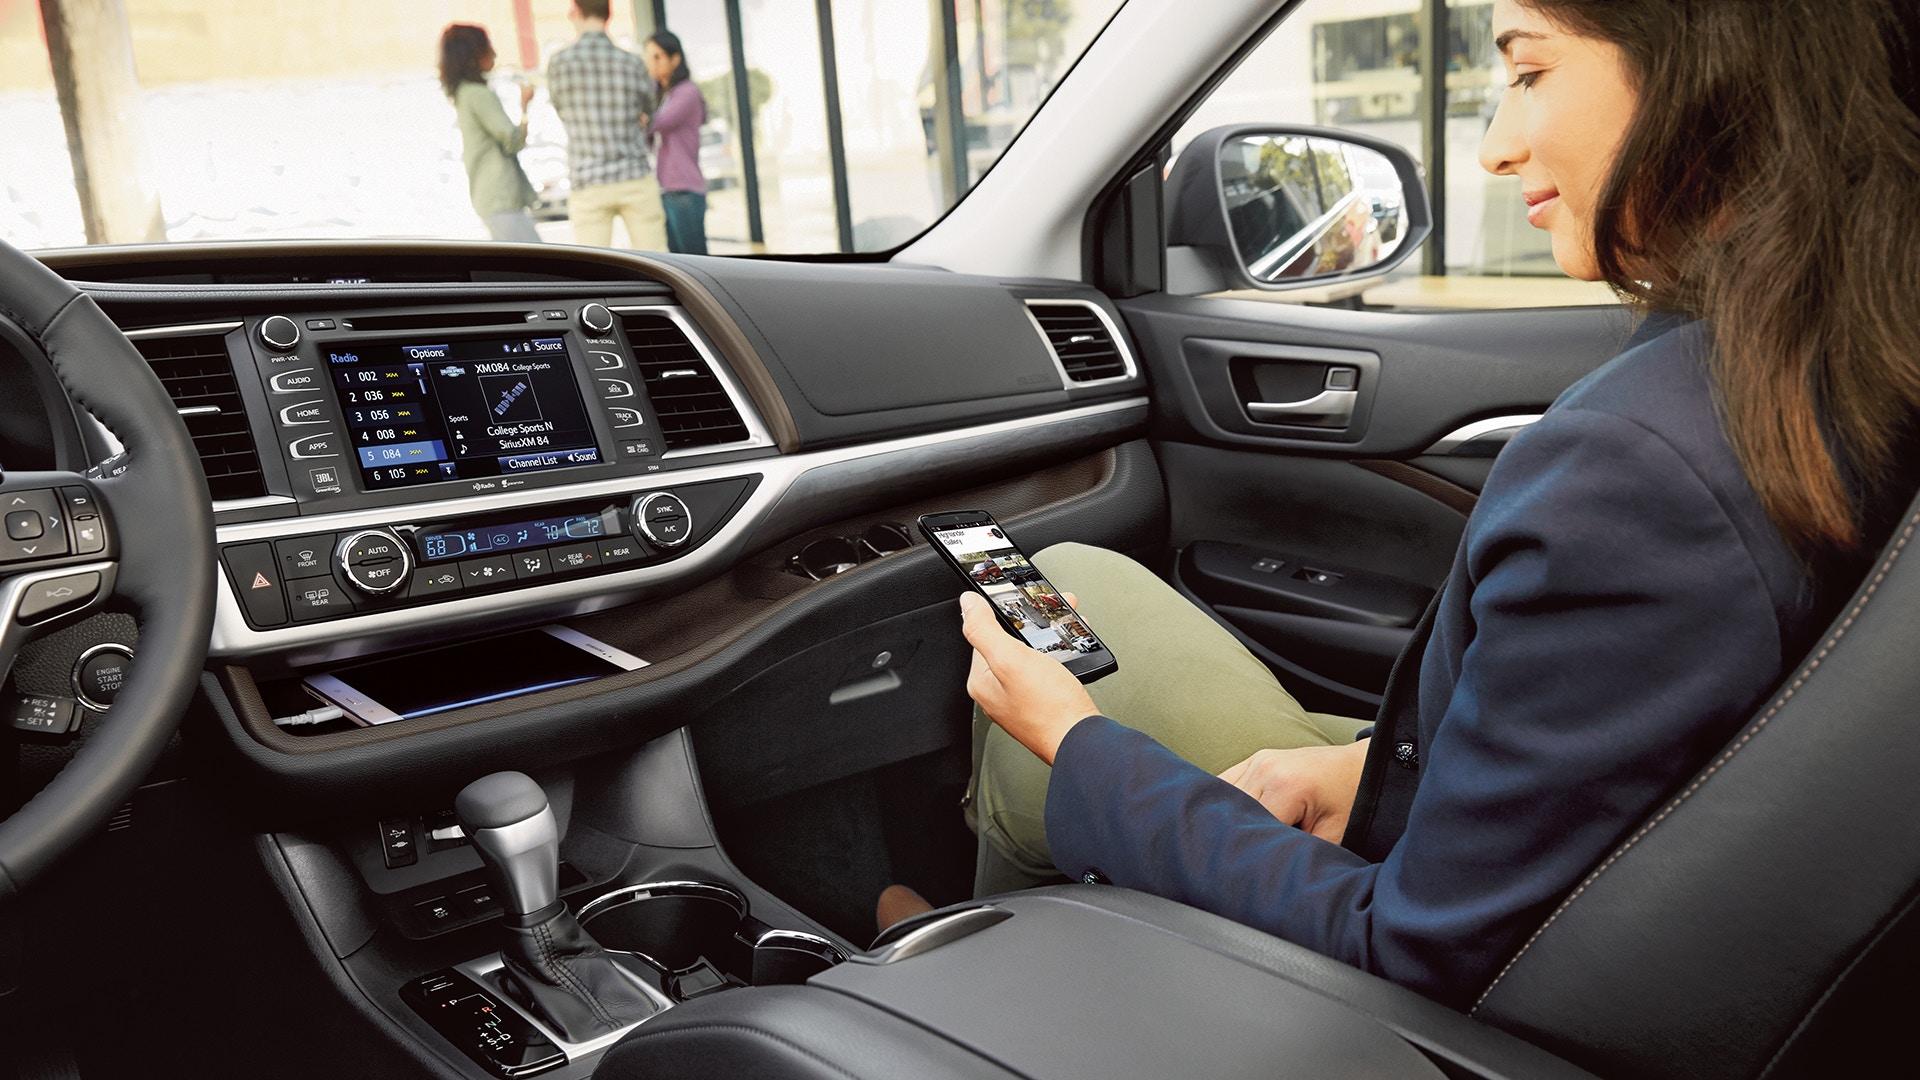 2019 Toyota Highlander Dash